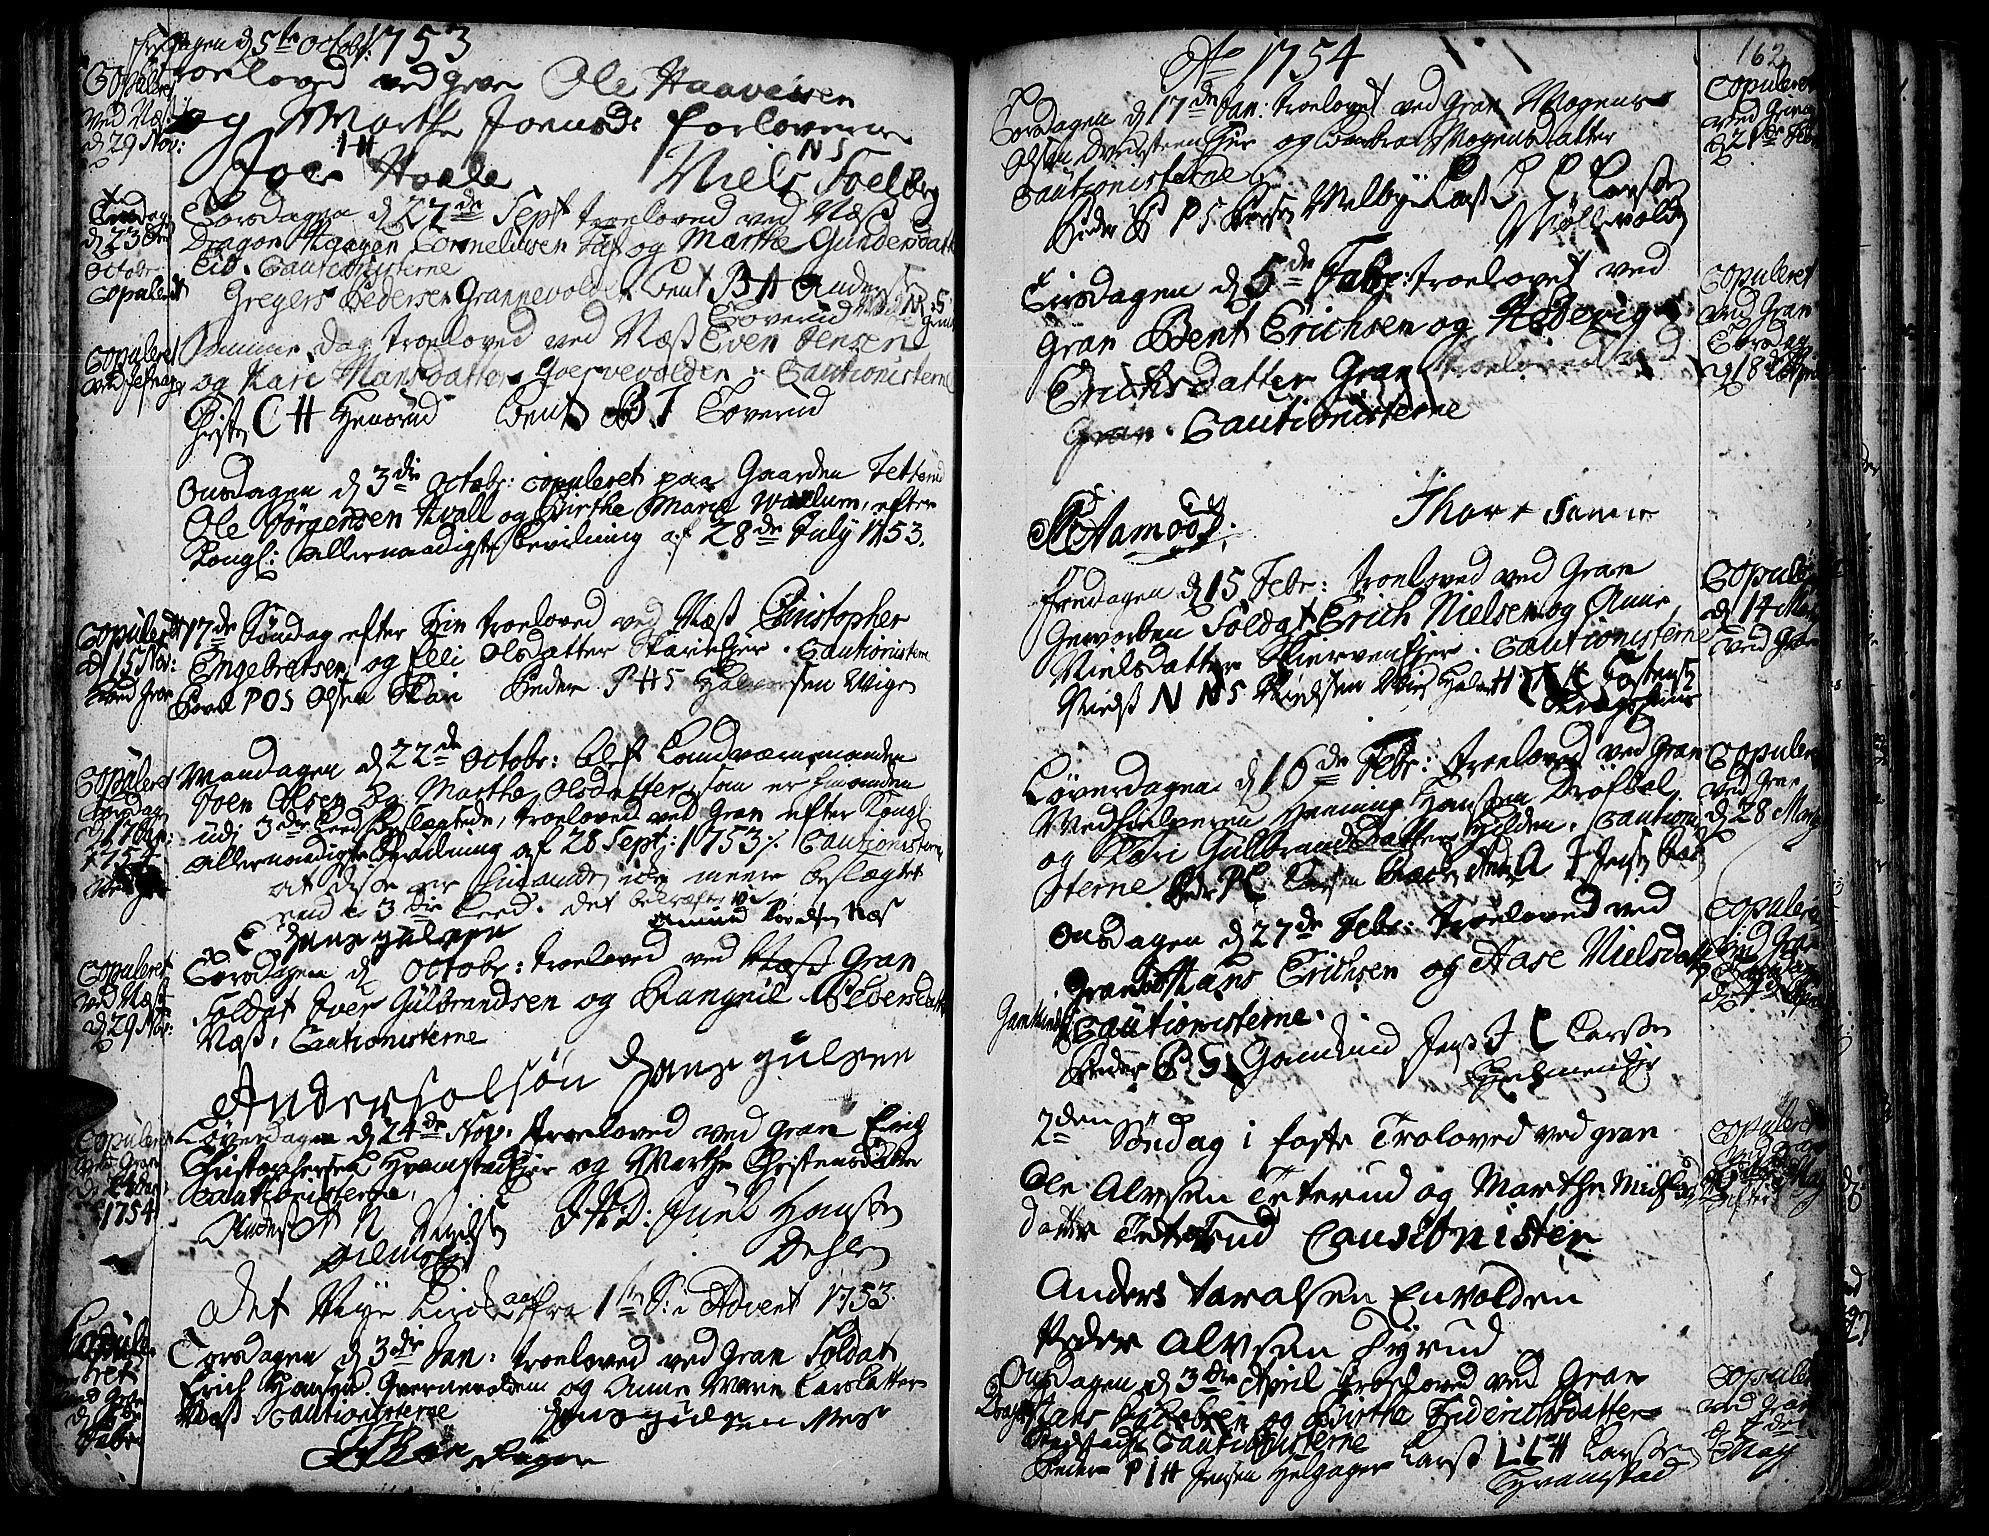 SAH, Gran prestekontor, Ministerialbok nr. 3, 1745-1758, s. 162